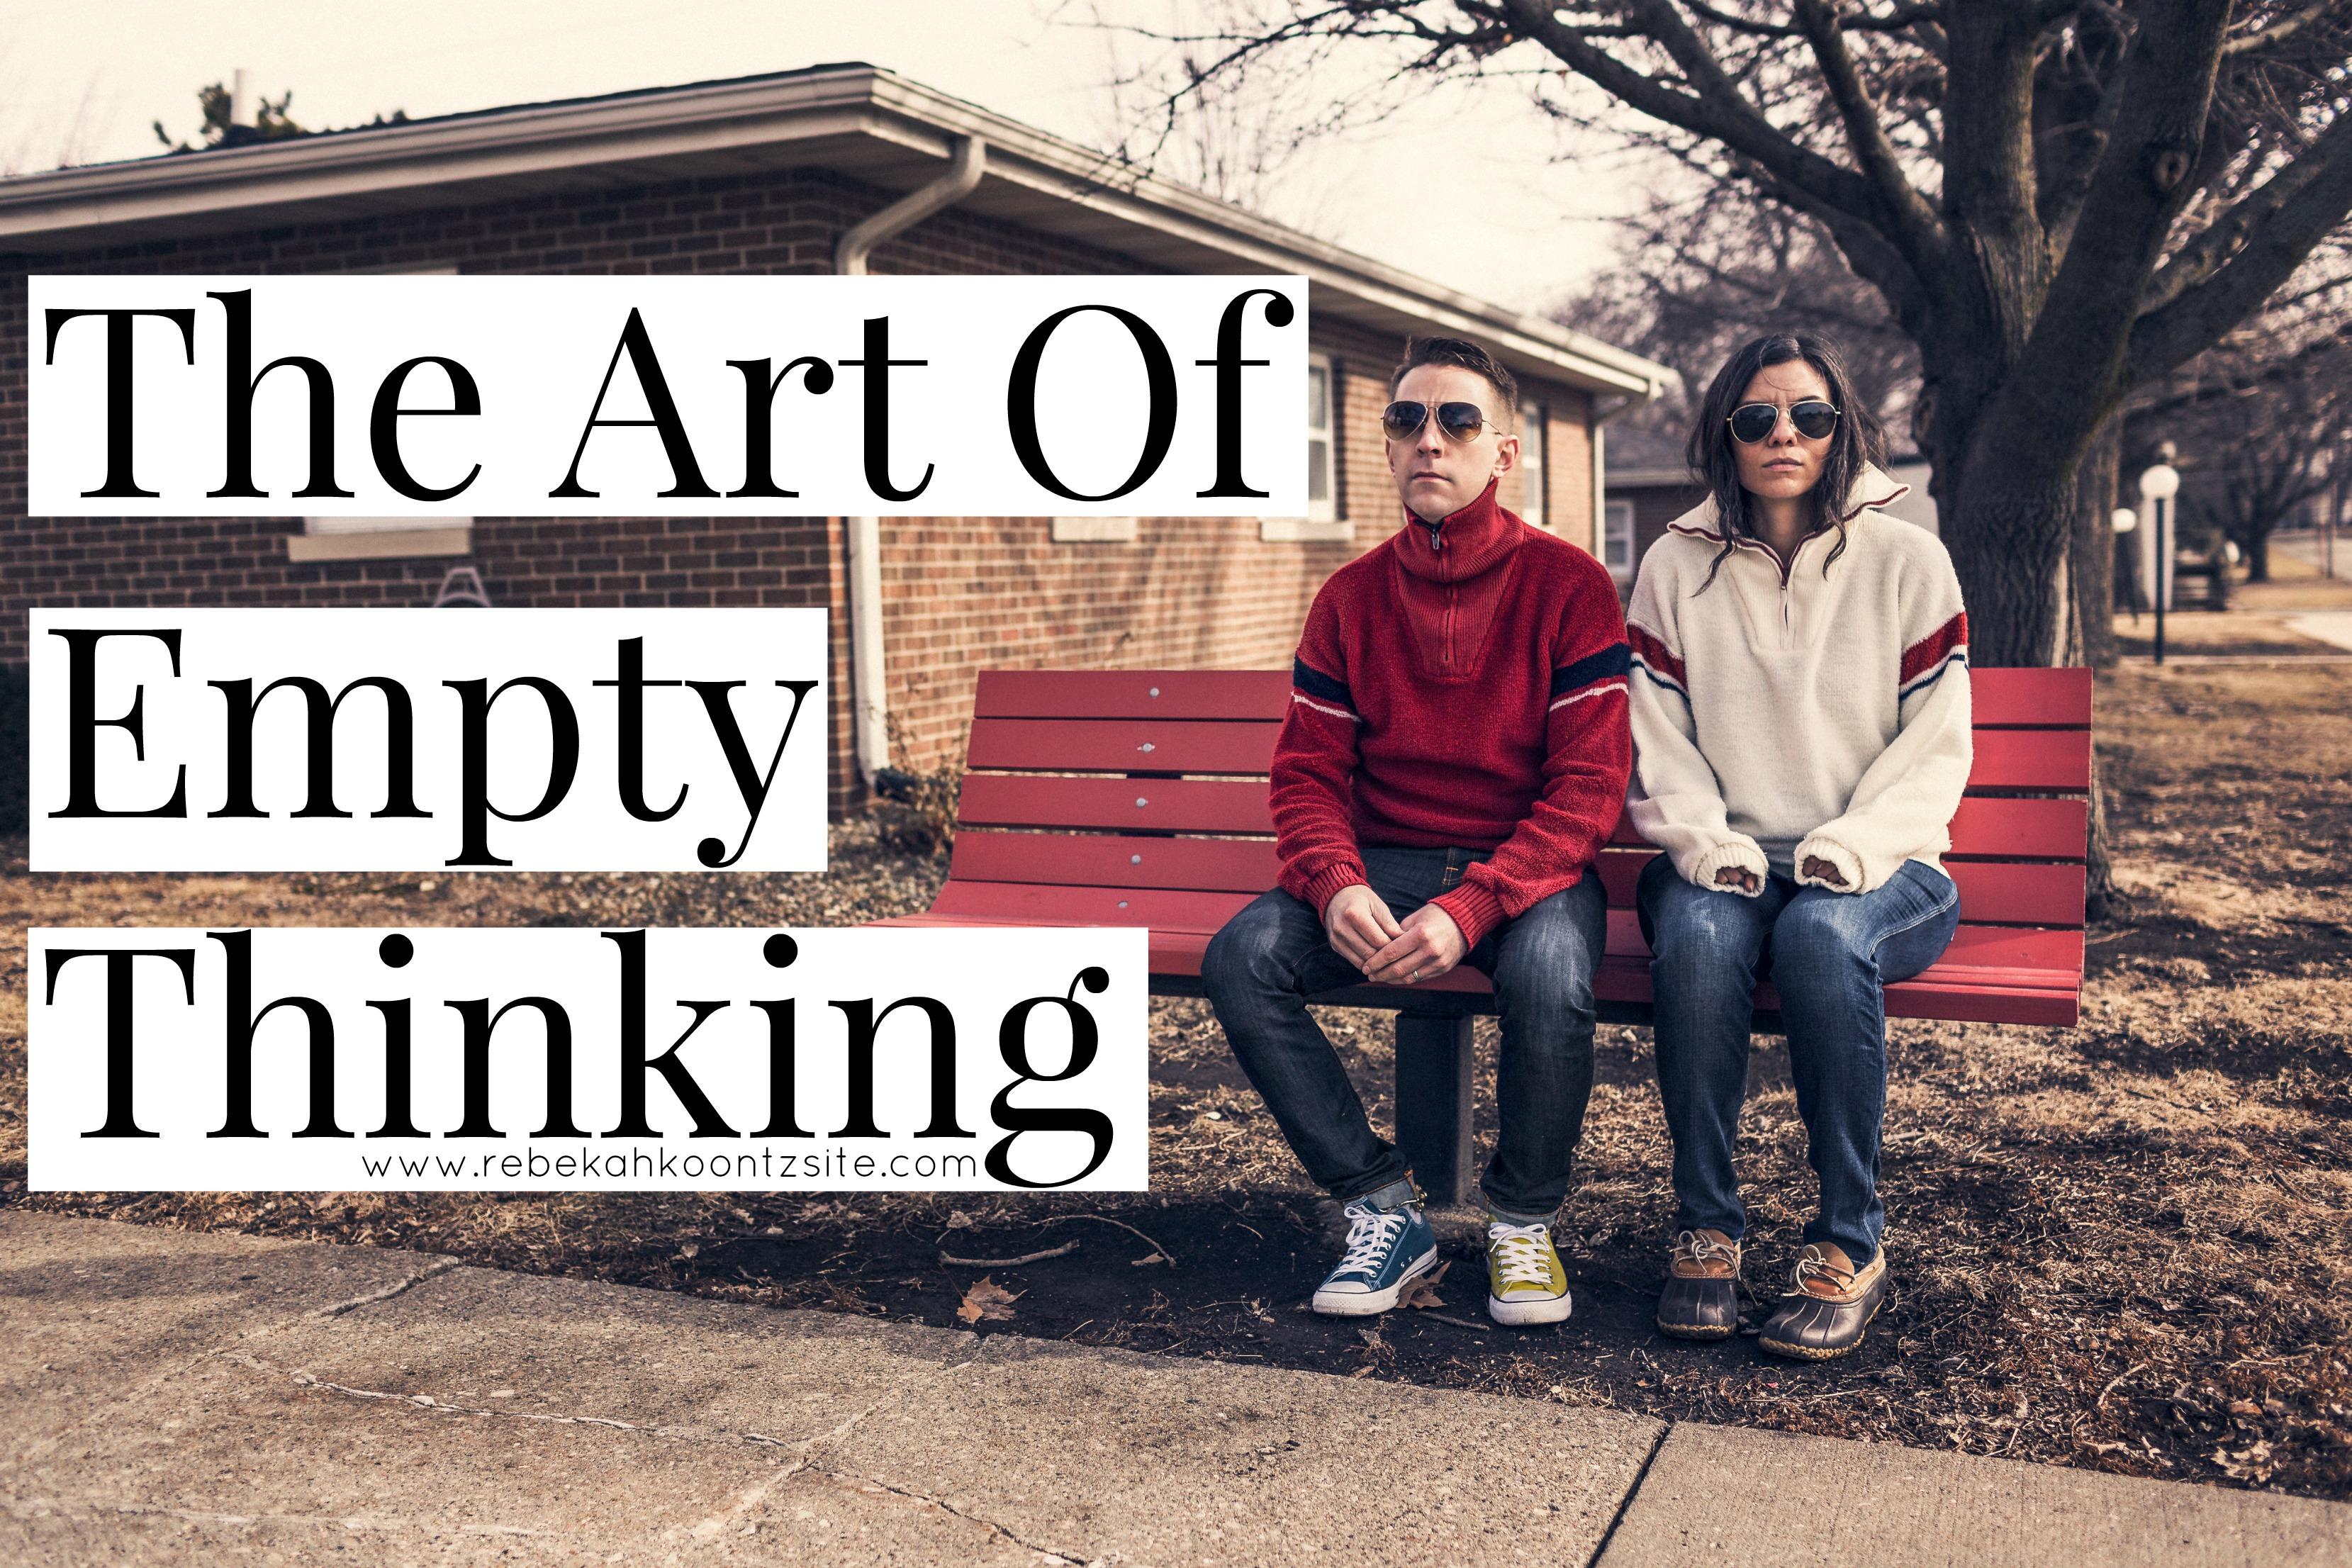 The art of empty thinking men vs women funny humor laugh blog lifestyle rebekah rebecca counts koontz